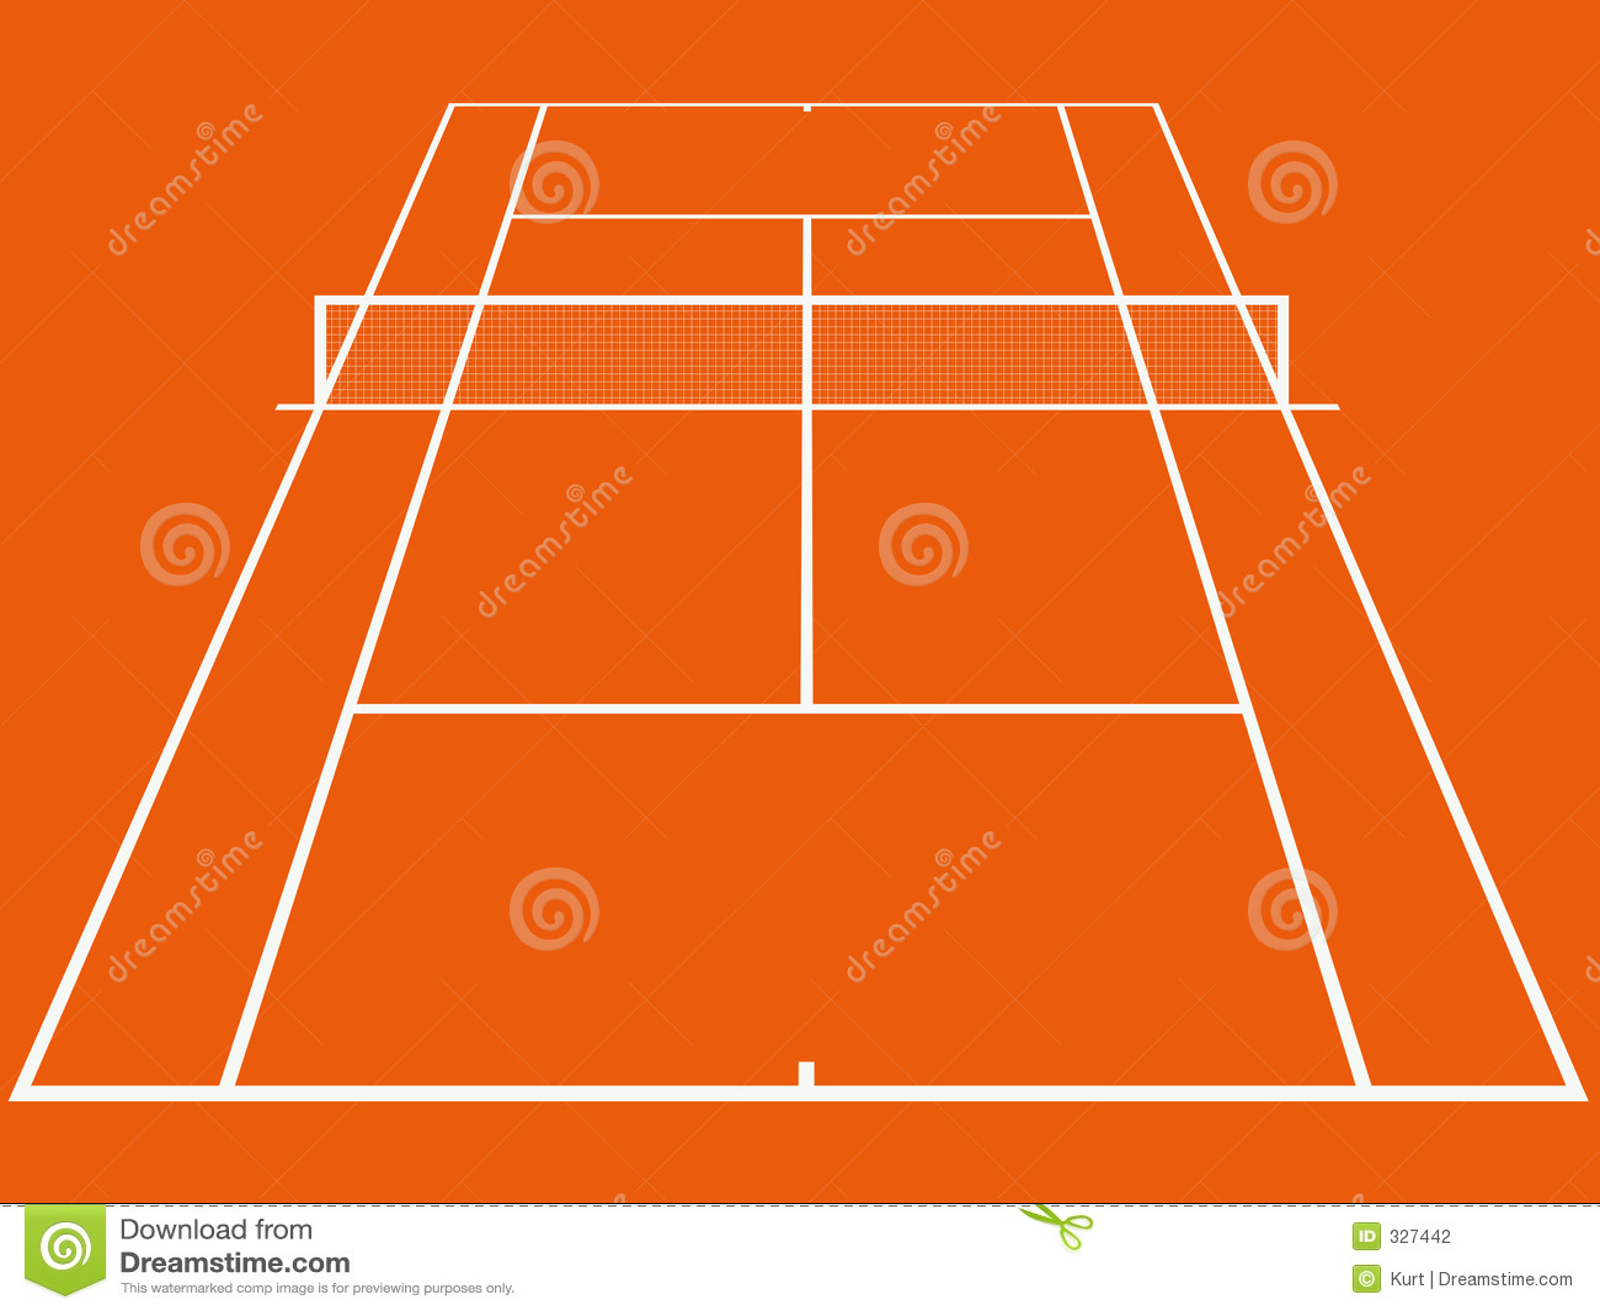 Lines Tennis Court Stock Illustrations – 188 Lines Tennis Court ...